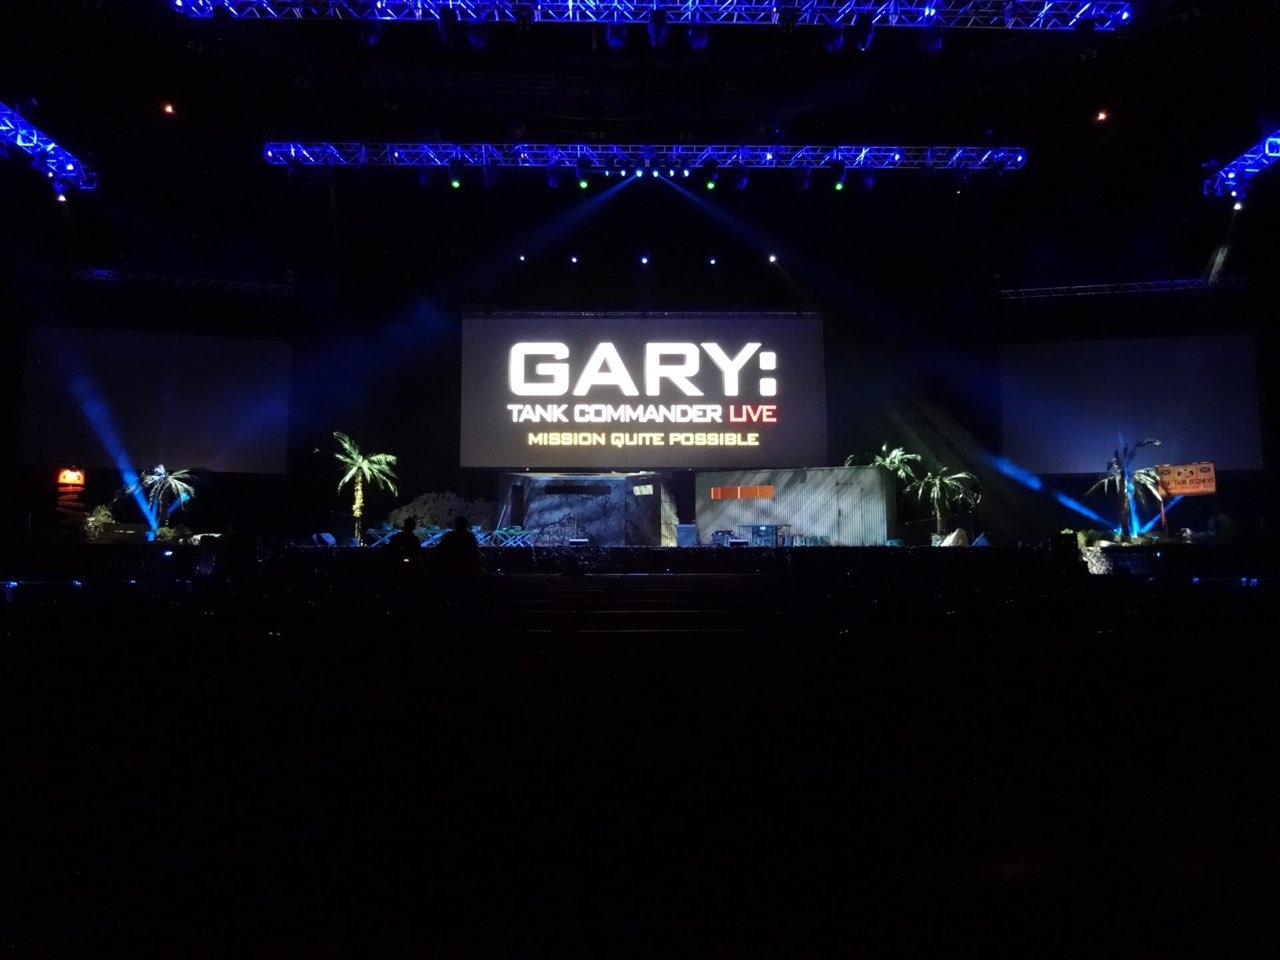 Gary: Tank Commander Live